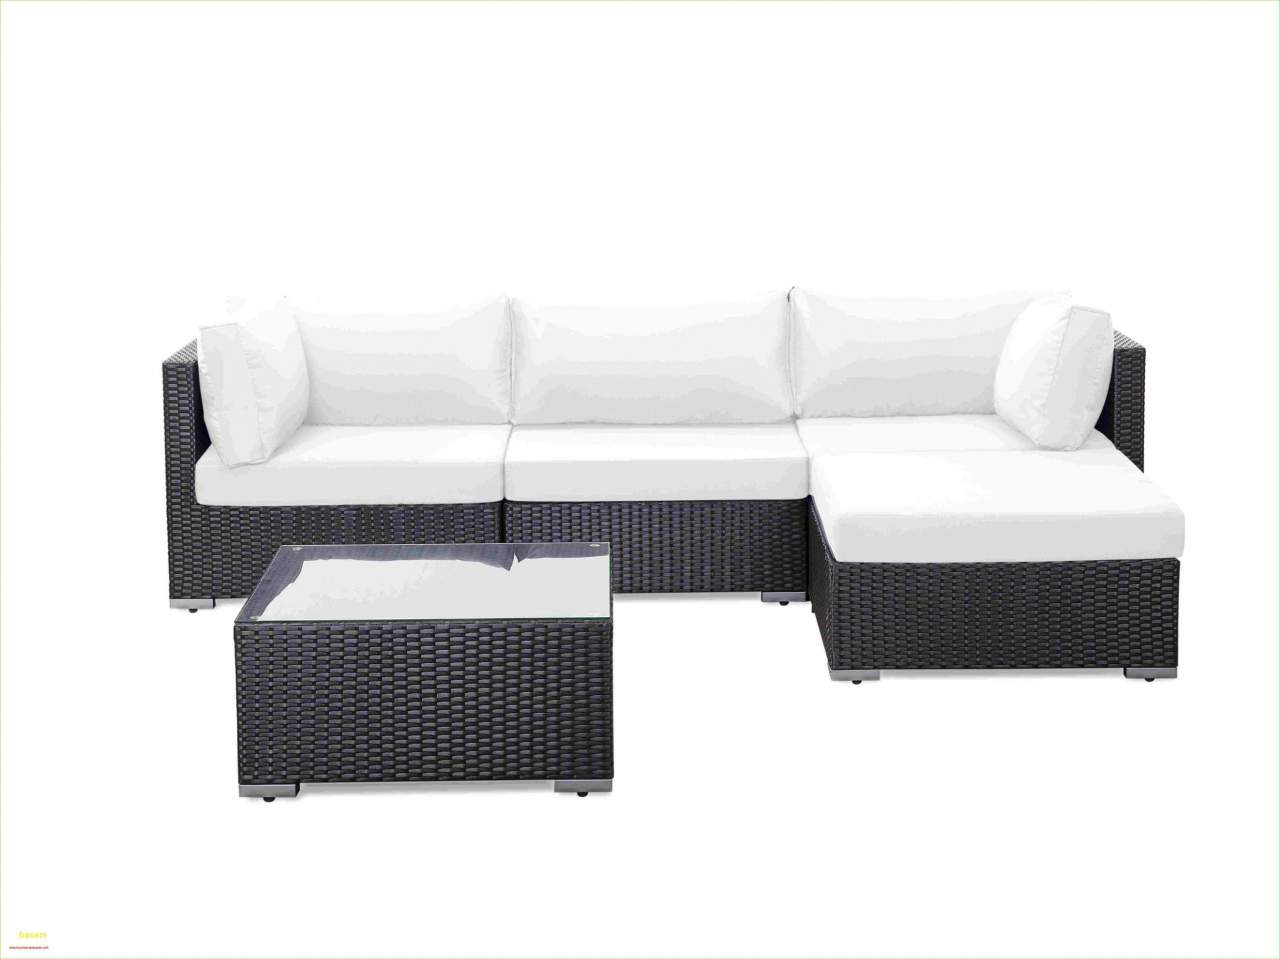 cheap patio chairs garten sale neu lounge outdoor einzigartig wicker outdoor sofa 0d durch cheap patio chairs